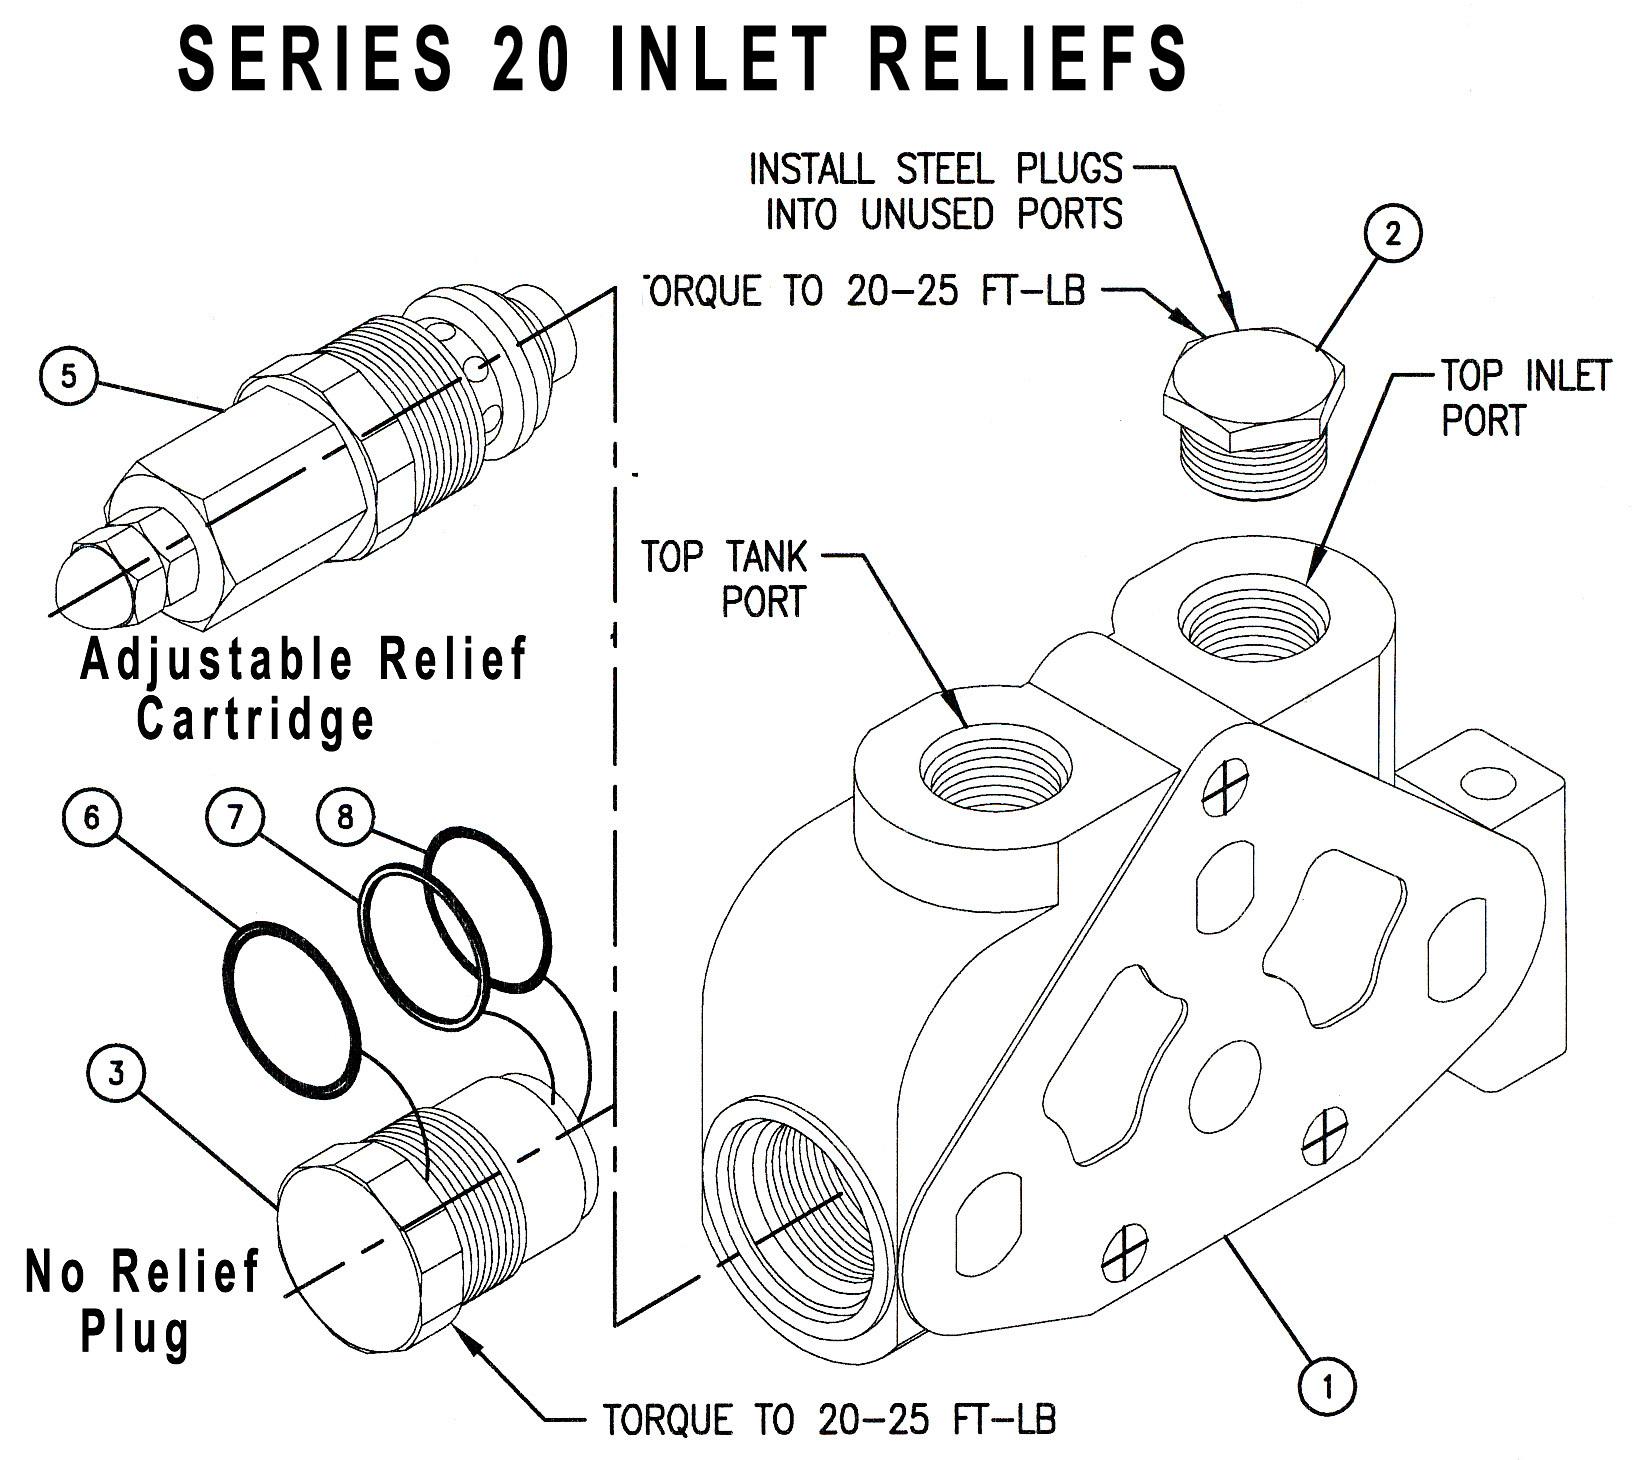 290001 - No Relief plug 290001